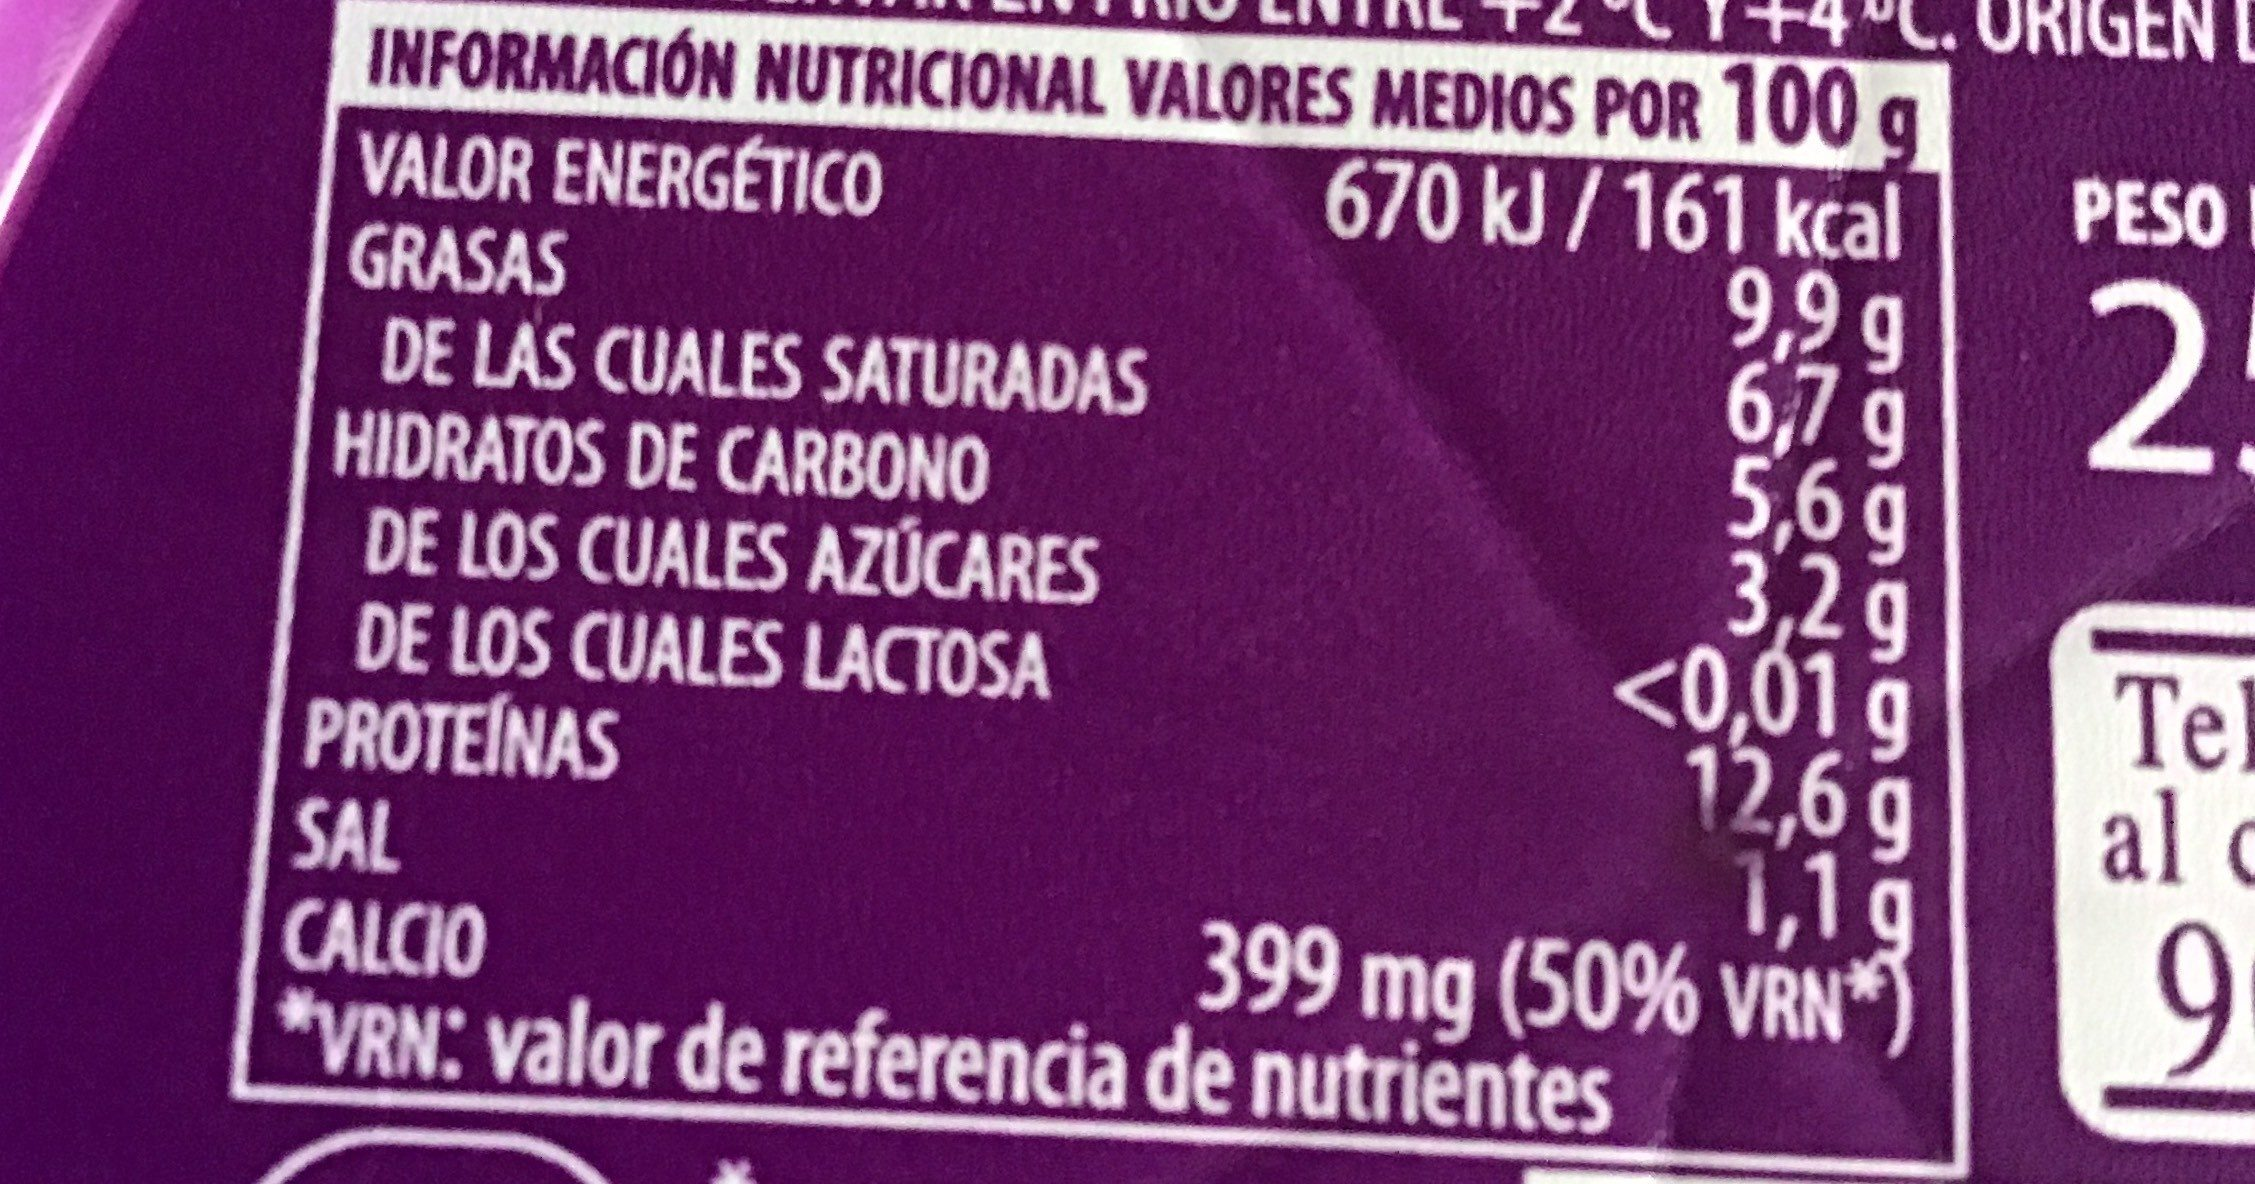 Queso fesco sin lactosa - Información nutricional - fr